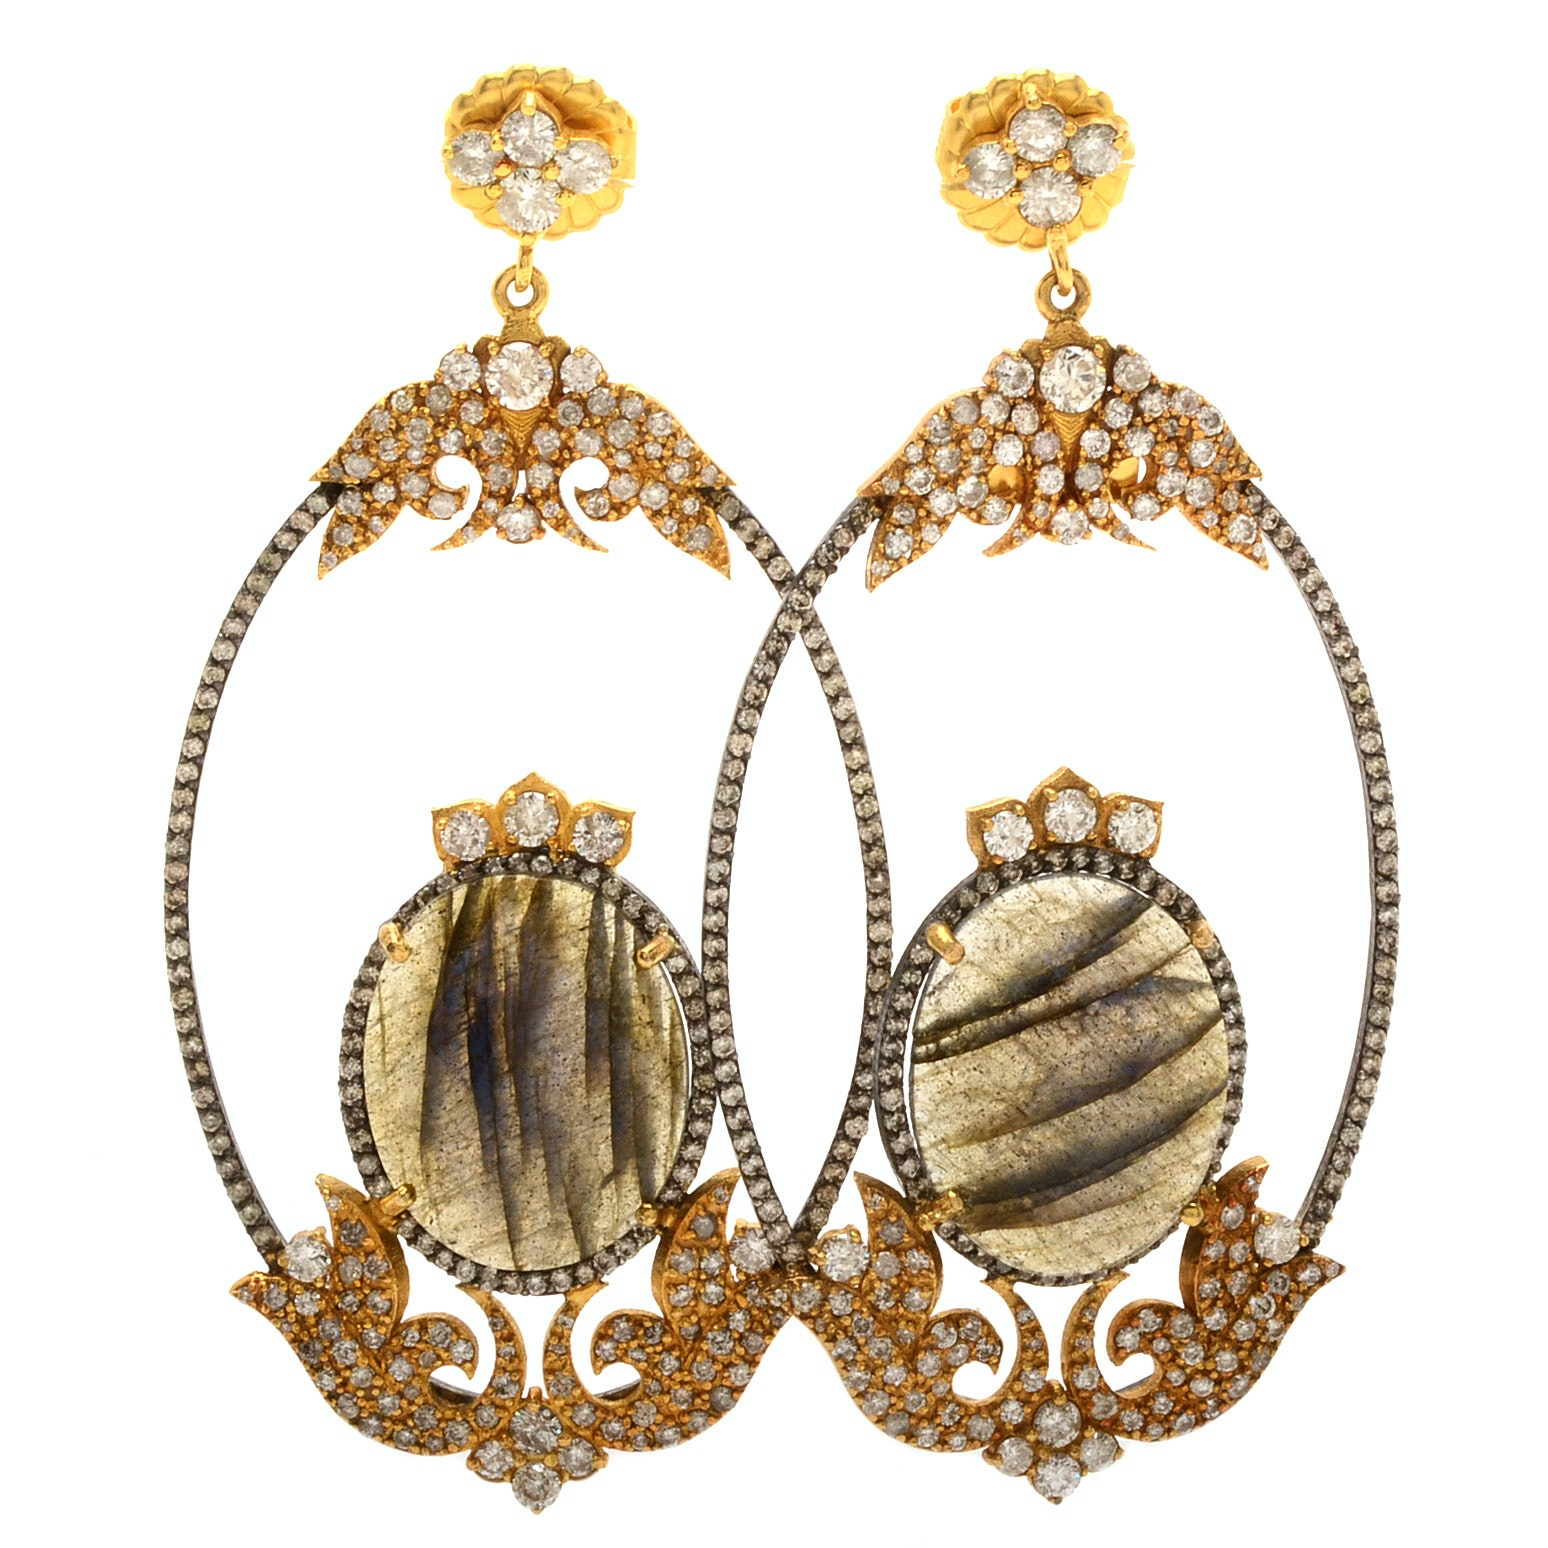 Sara Weinstock 18K Yellow Gold 5.67 CTW Diamond and Labradorite Earrings